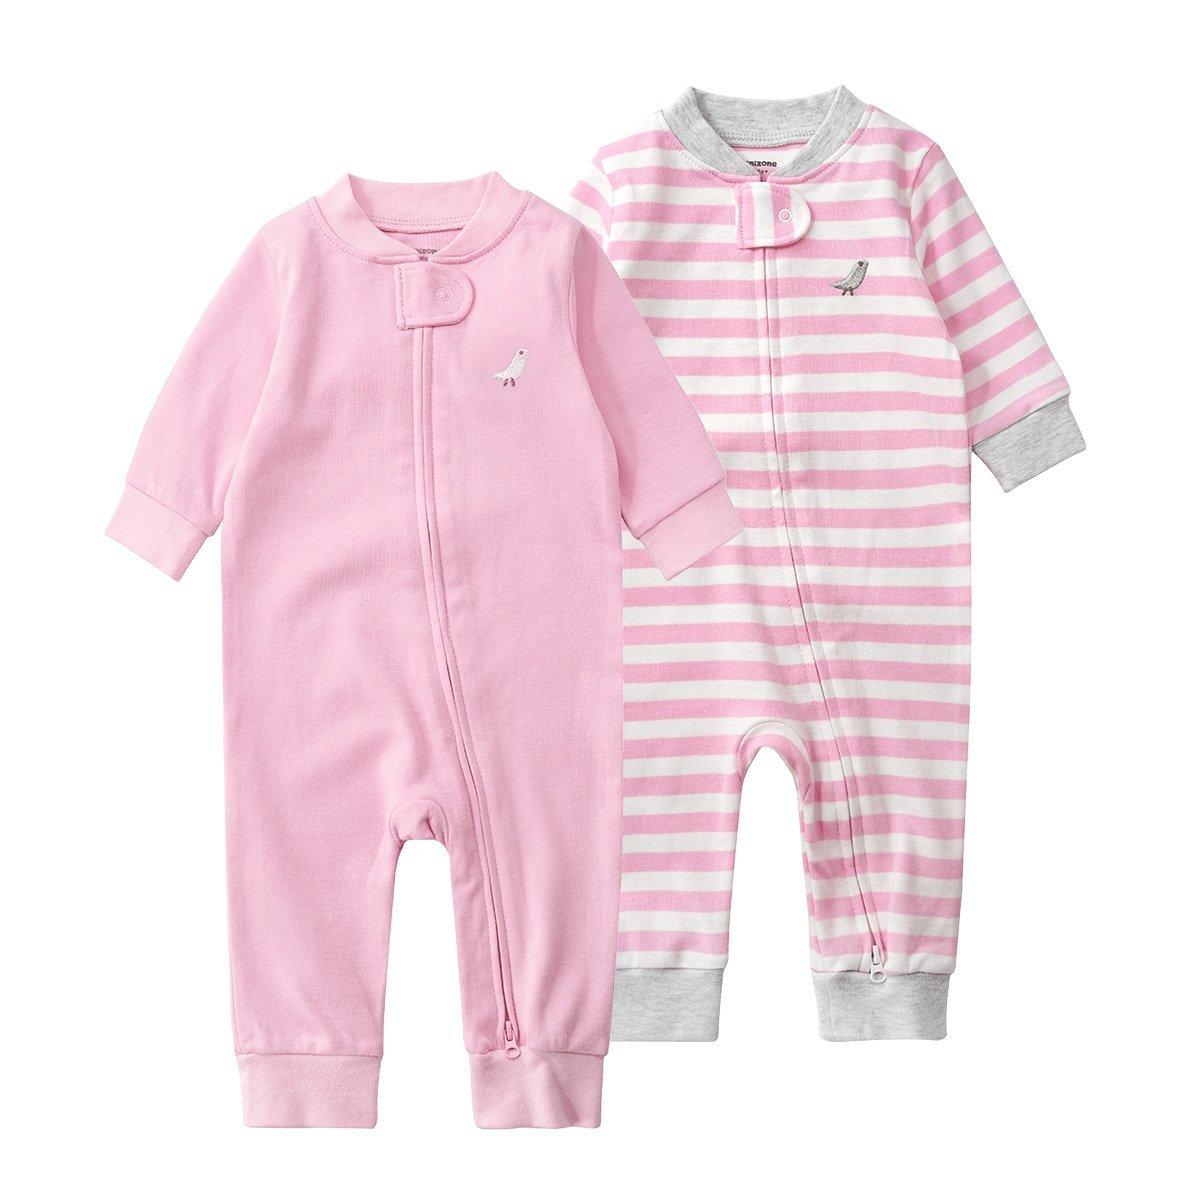 Pack de 2 Pijama para Bebé, Manga Larga Mameluco Pelele Mono Body Trajes: Amazon.es: Bebé